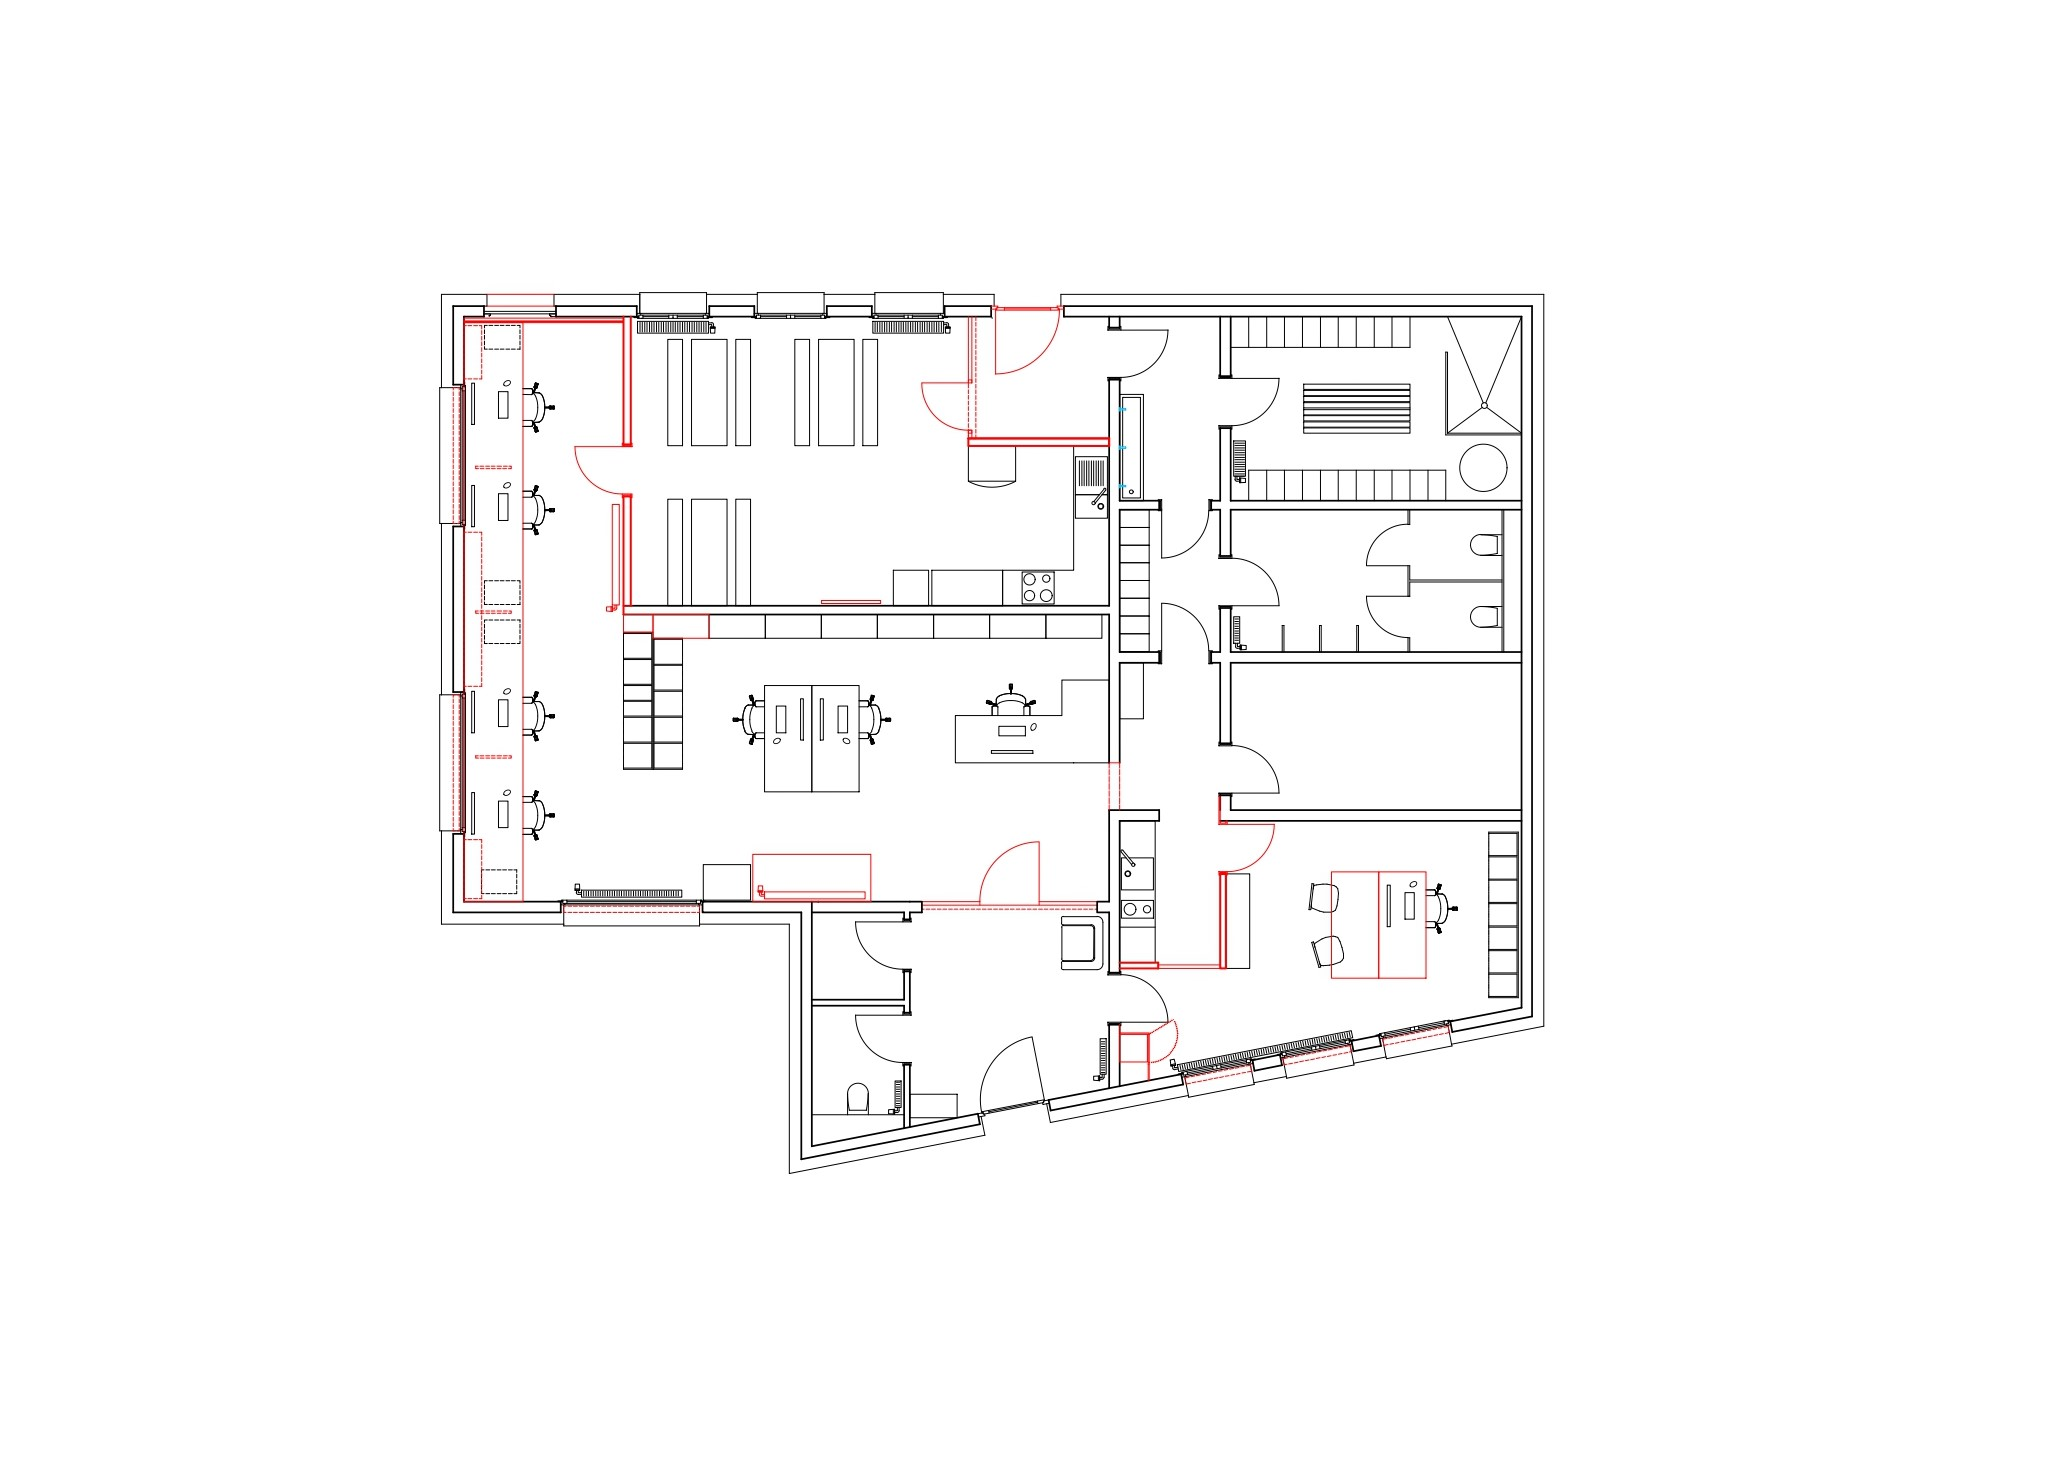 plan_page-0001